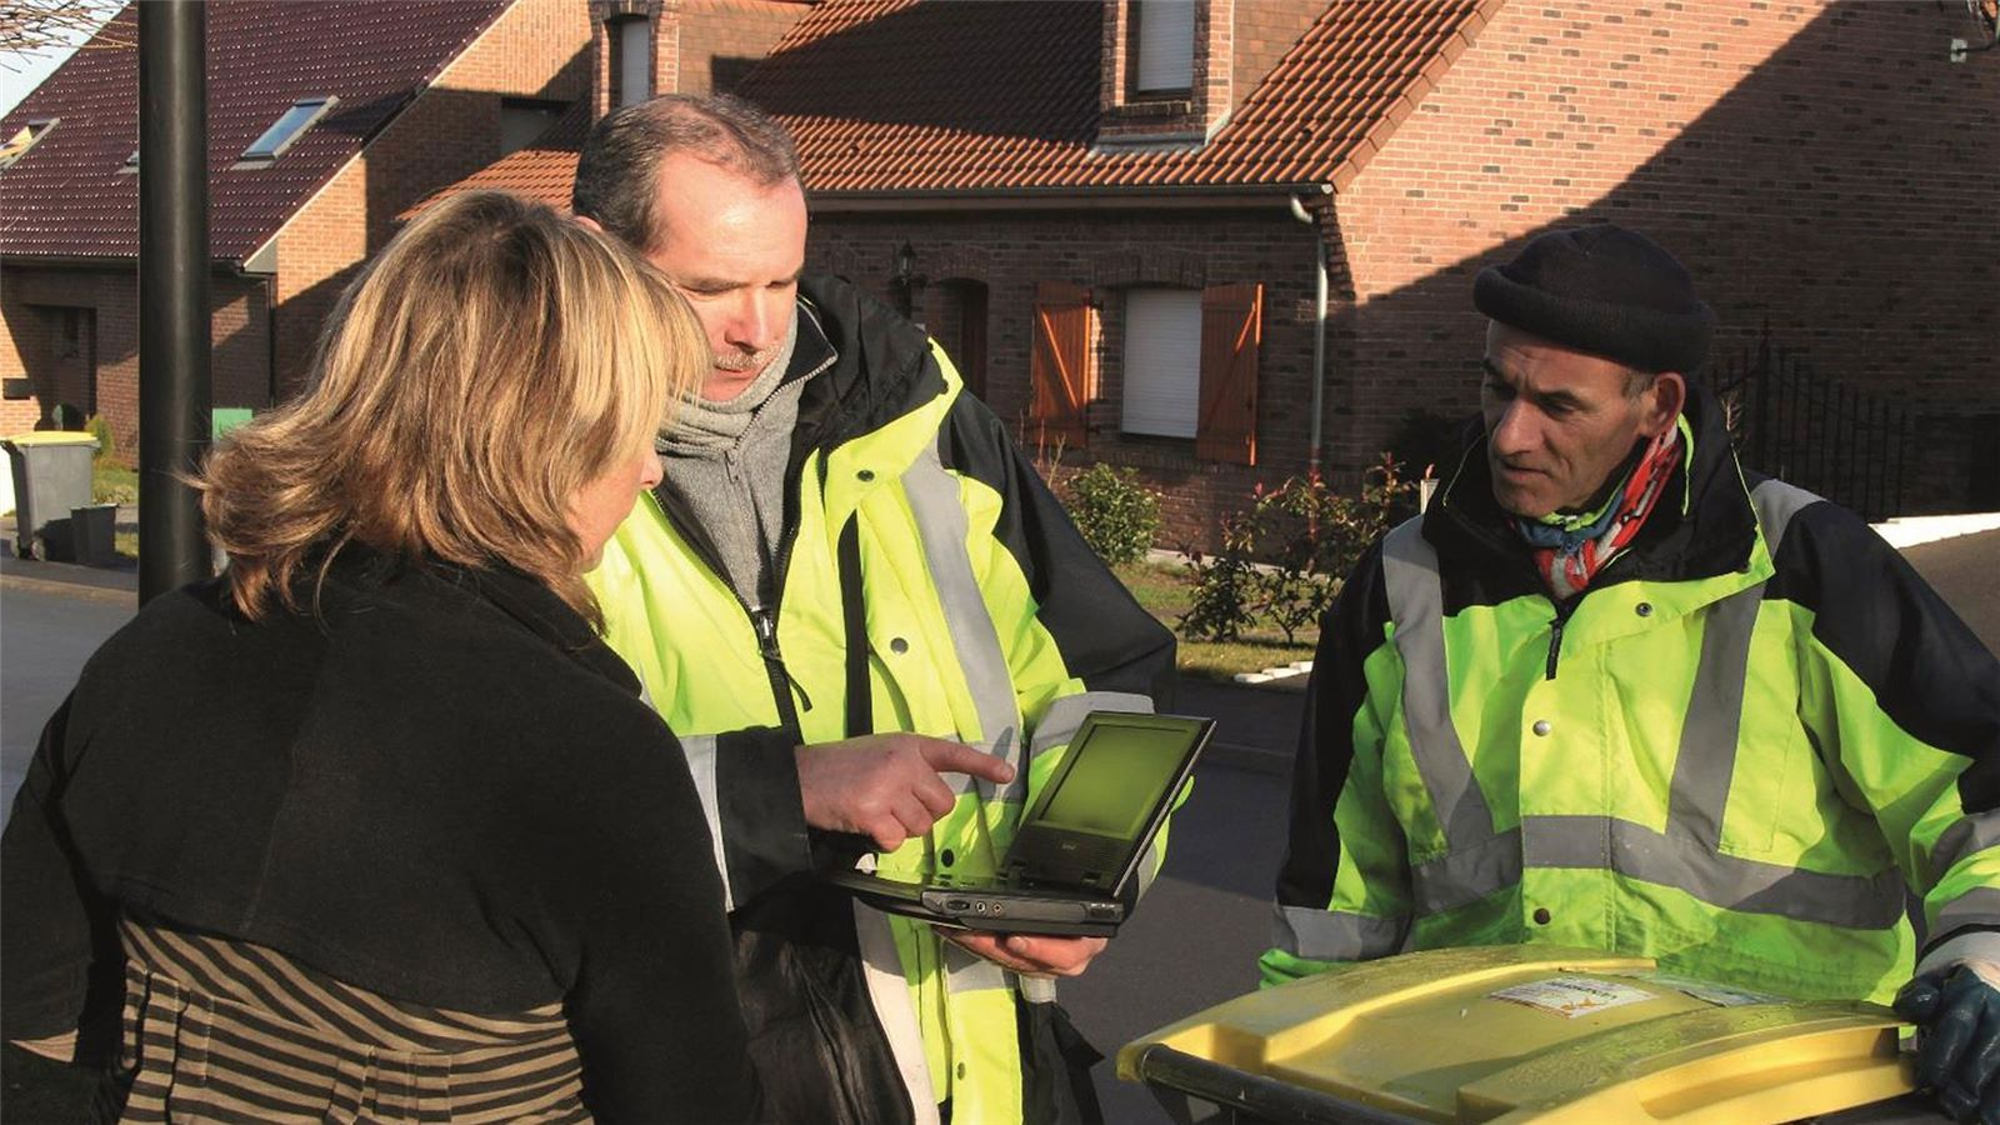 Valenciennes意识提高竞选活动废物管理